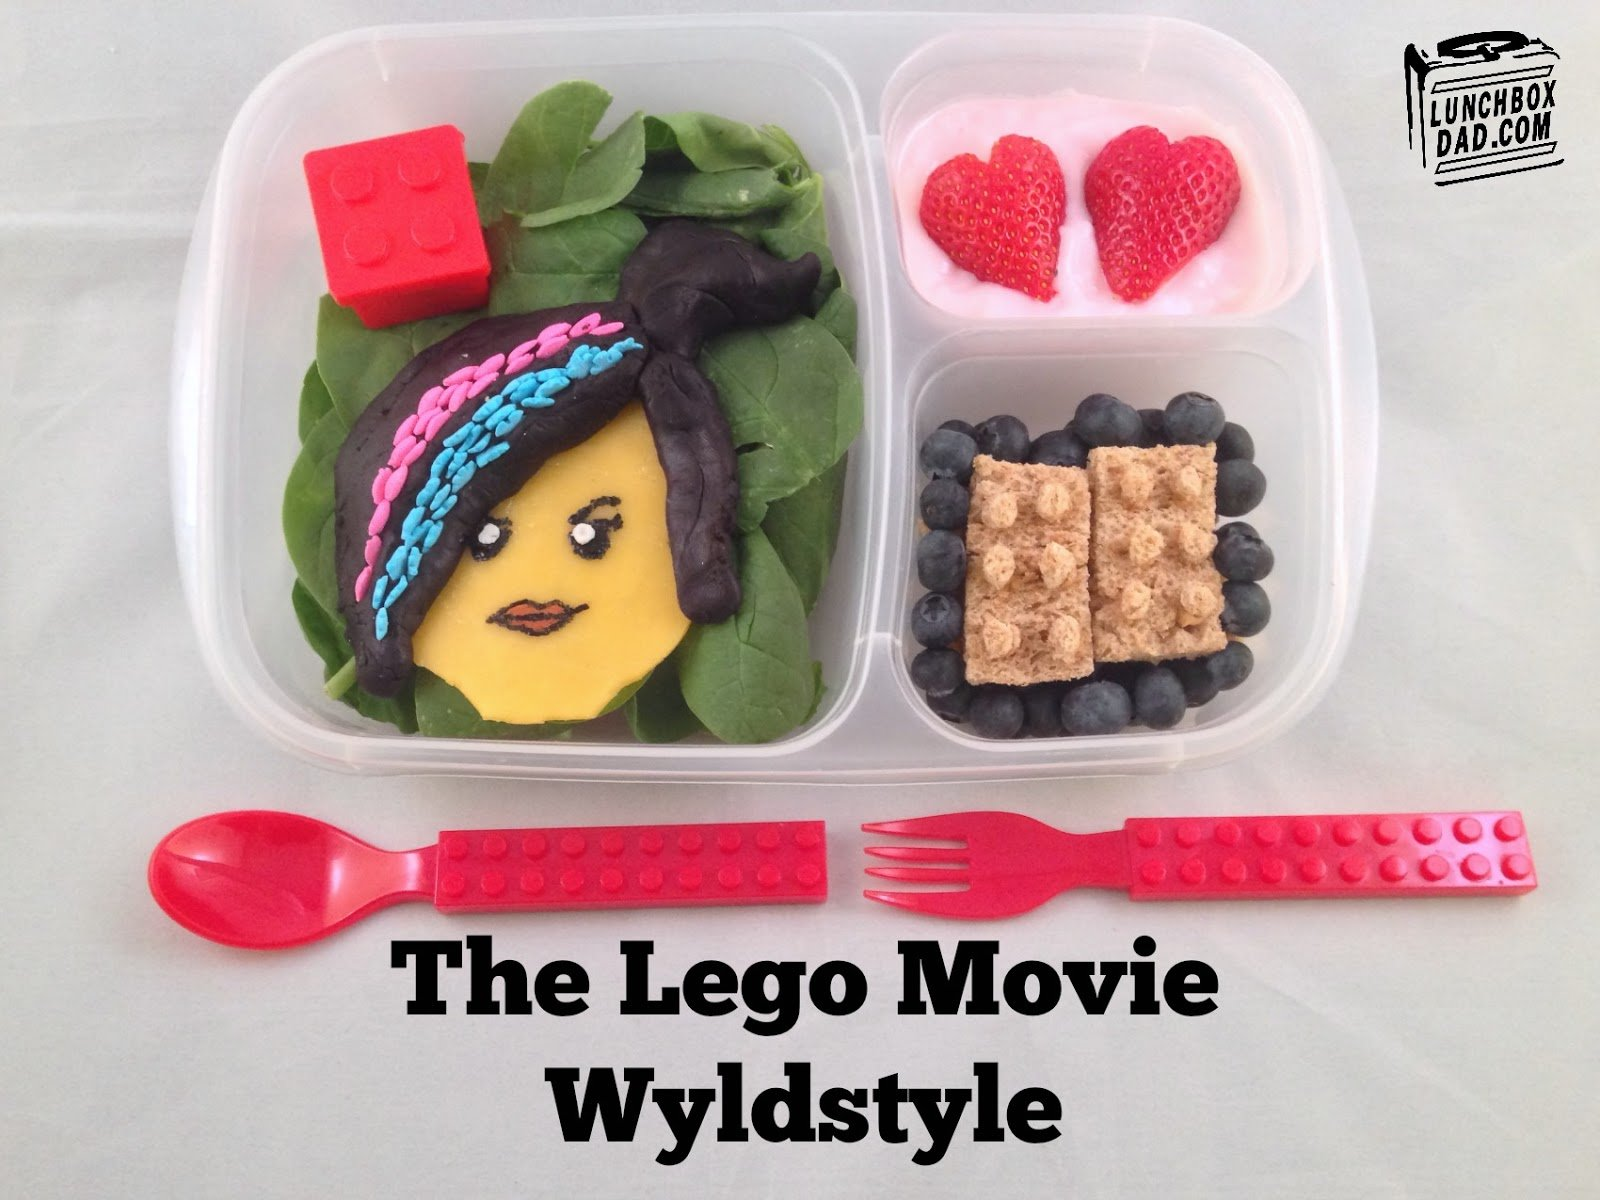 lego-movie-wyldstyle-2